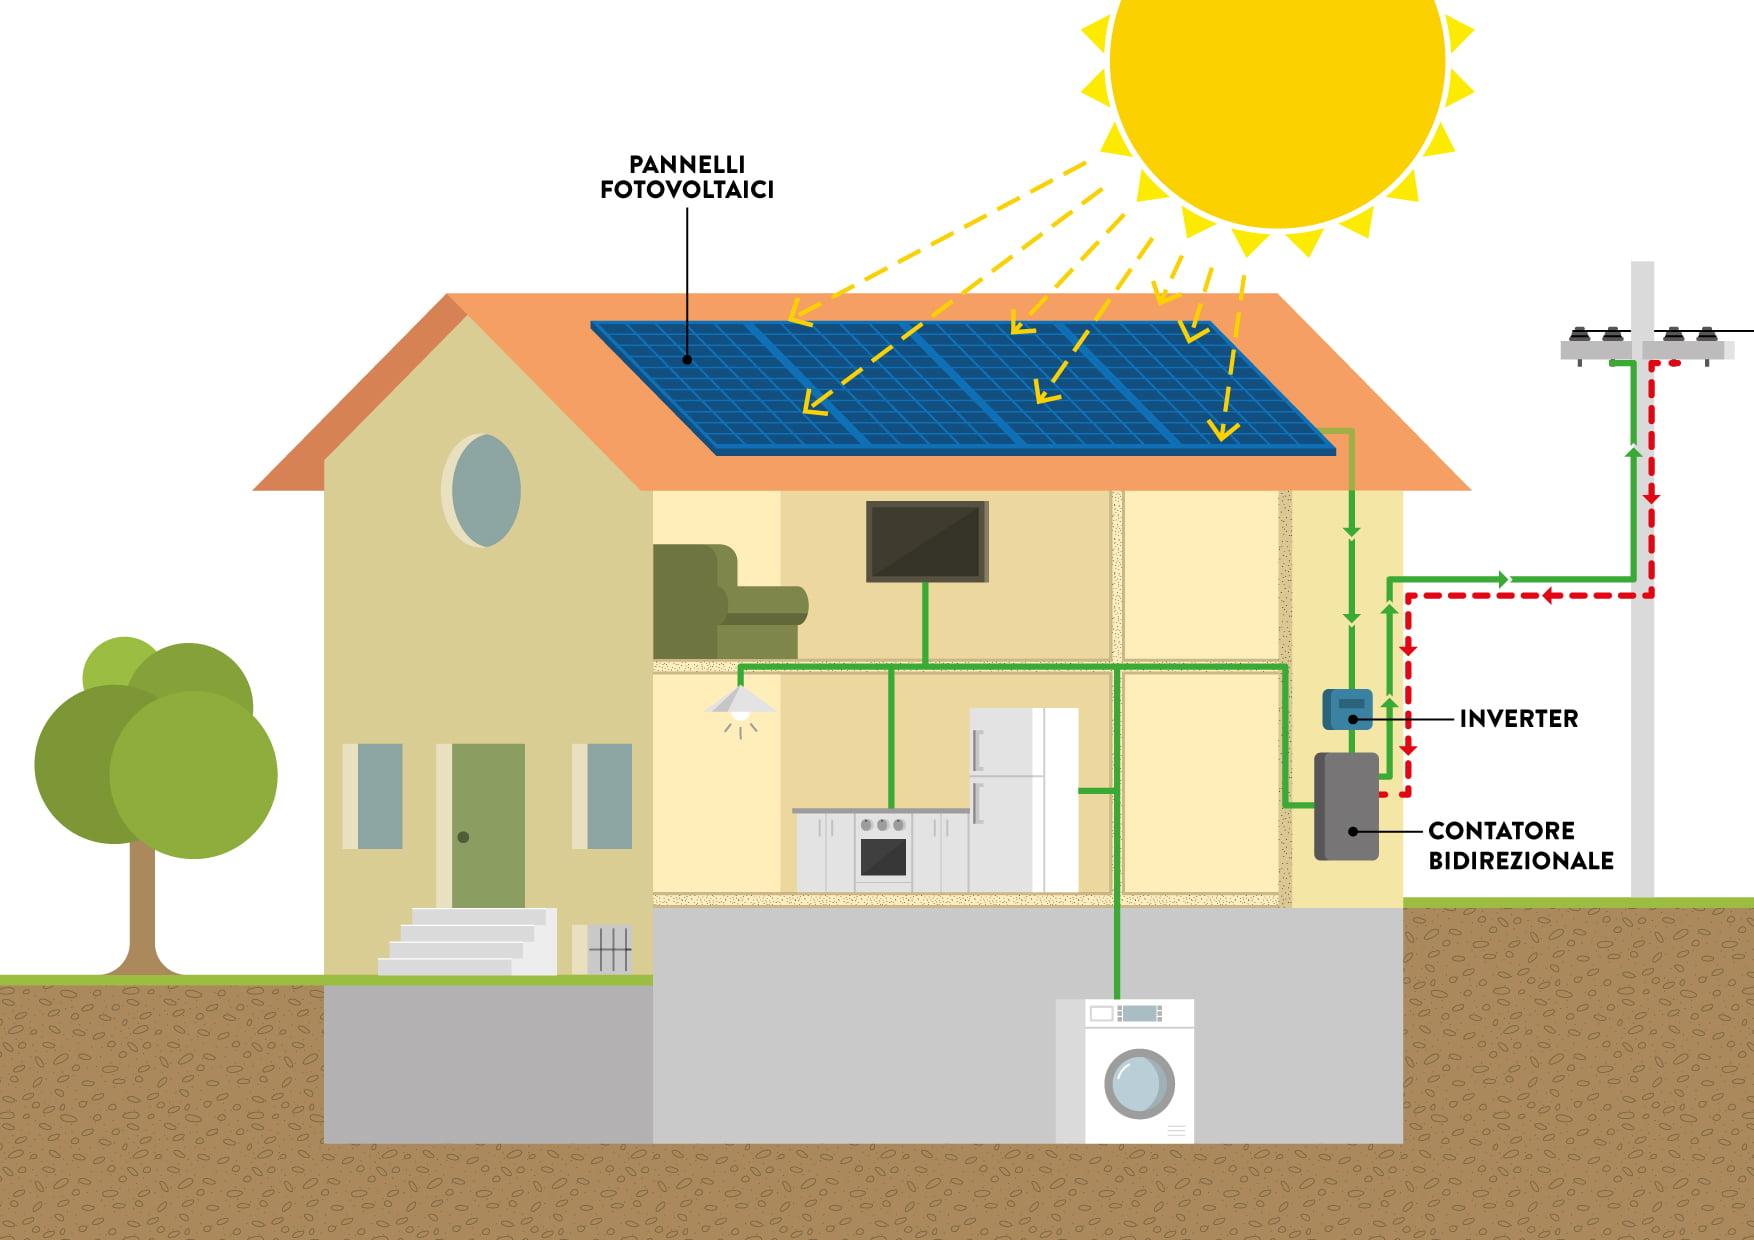 fotovoltaico SB energetica Energie rinnovabili risparmio economico